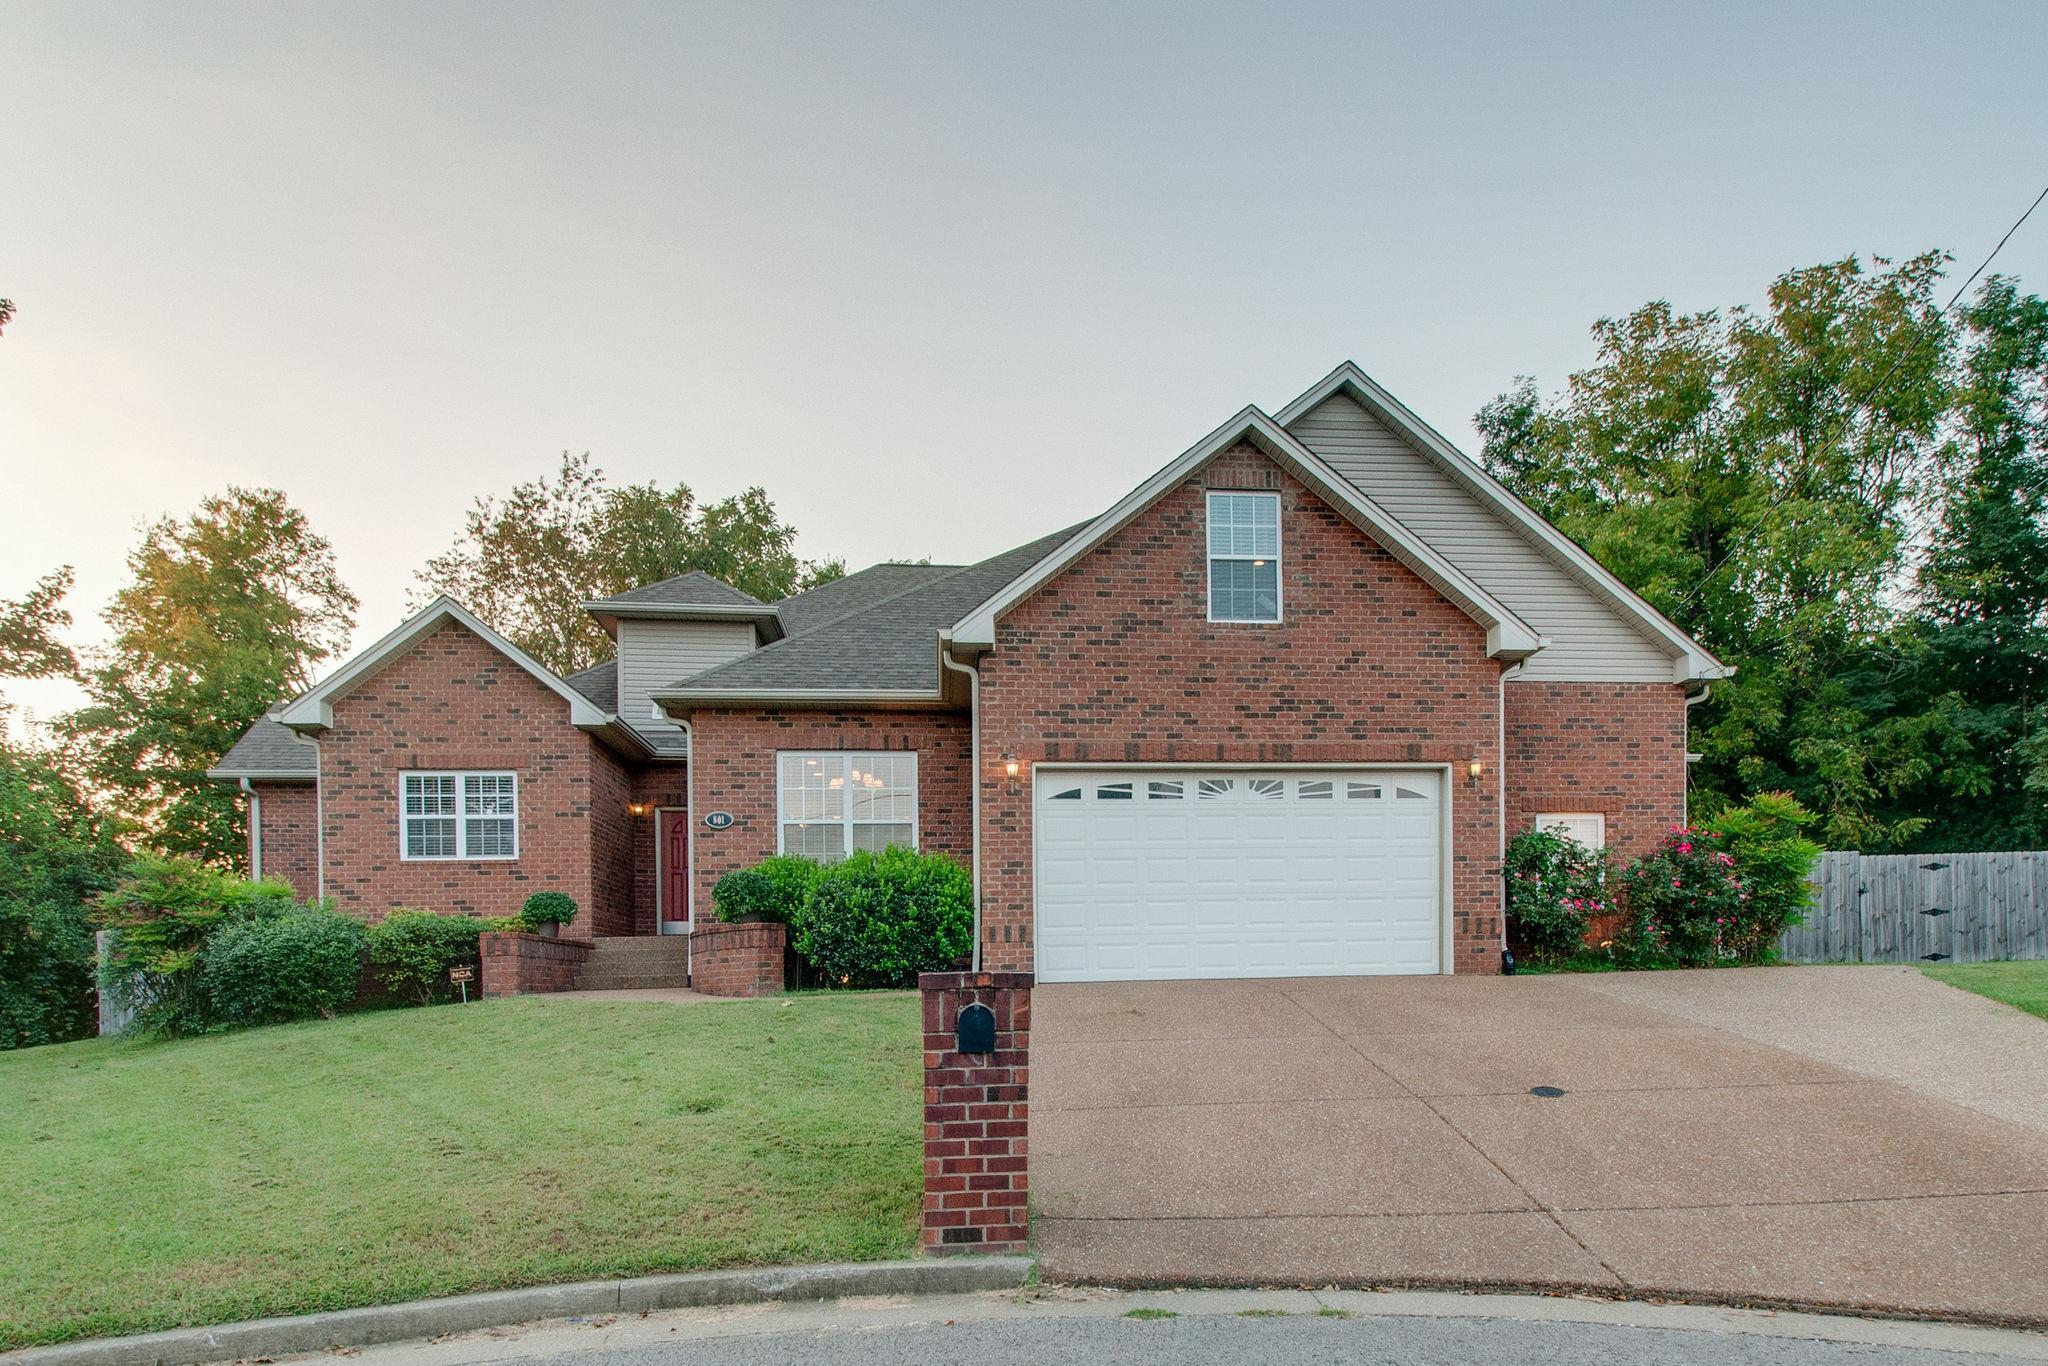 801 Crescent Hill Rd, Nashville, TN 37206 - Nashville, TN real estate listing